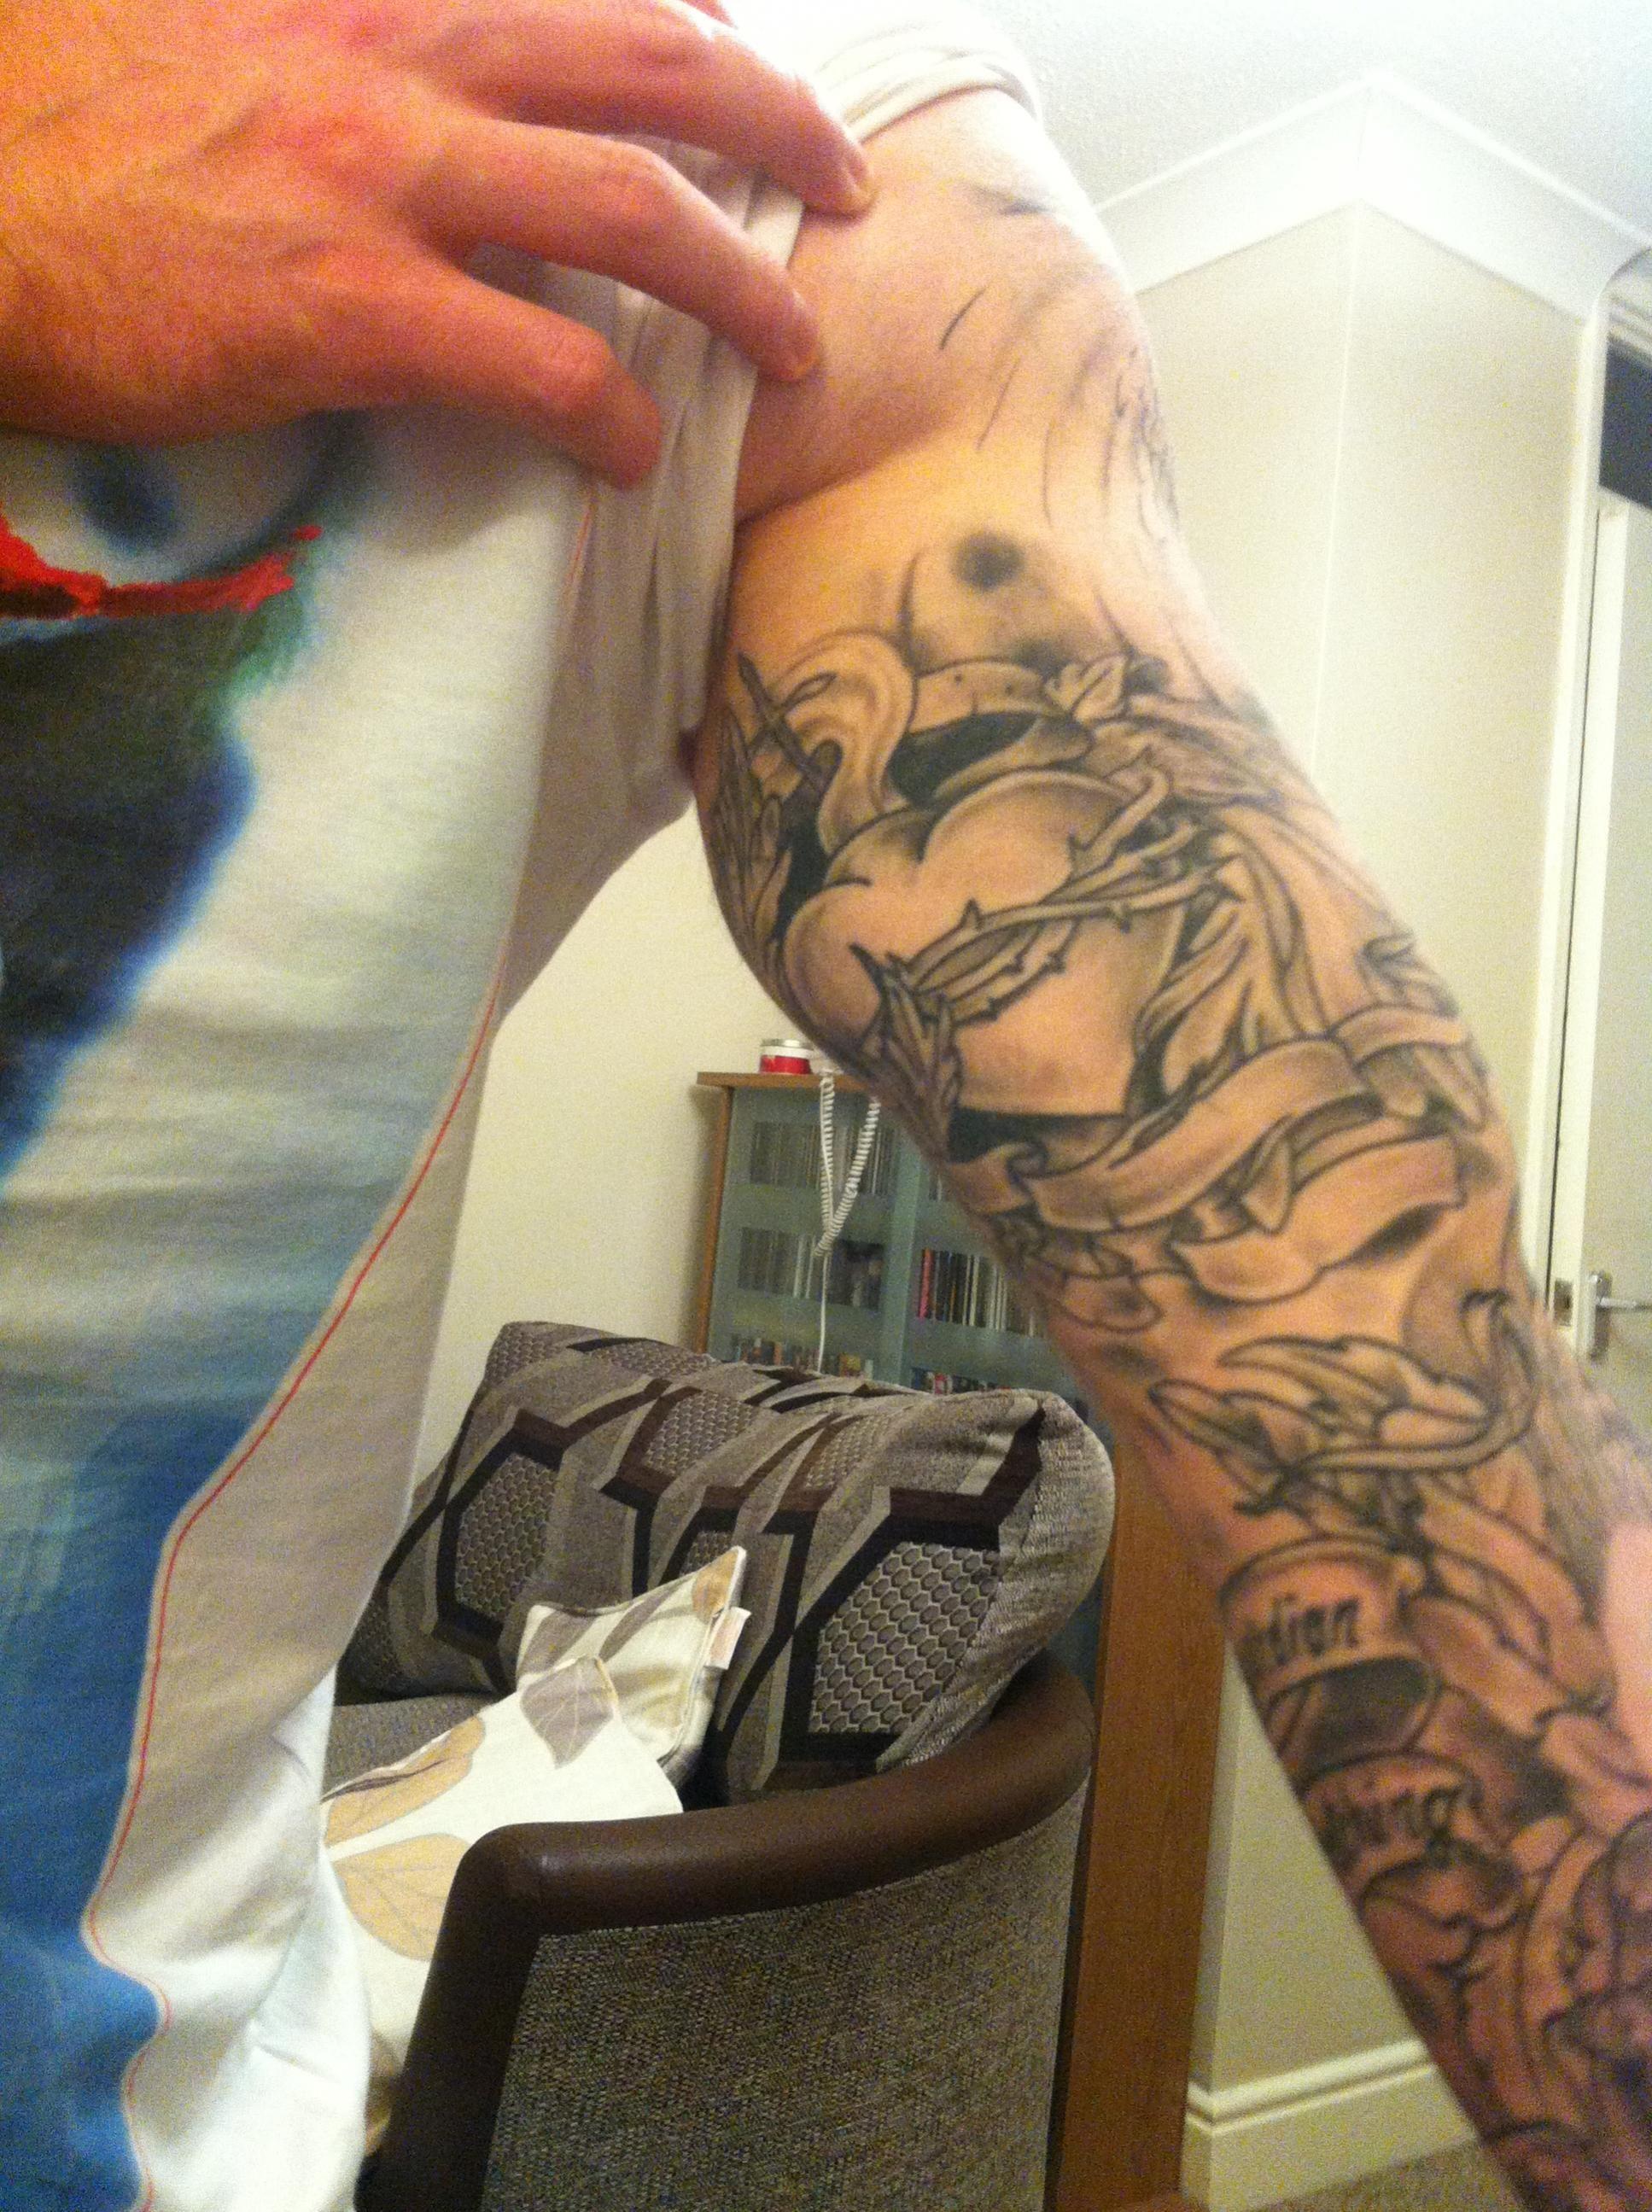 Smoke Tattoo Filler Smoke Tattoo Filler Ideas Smoke Tattoo Tattoo Filler Tattoos